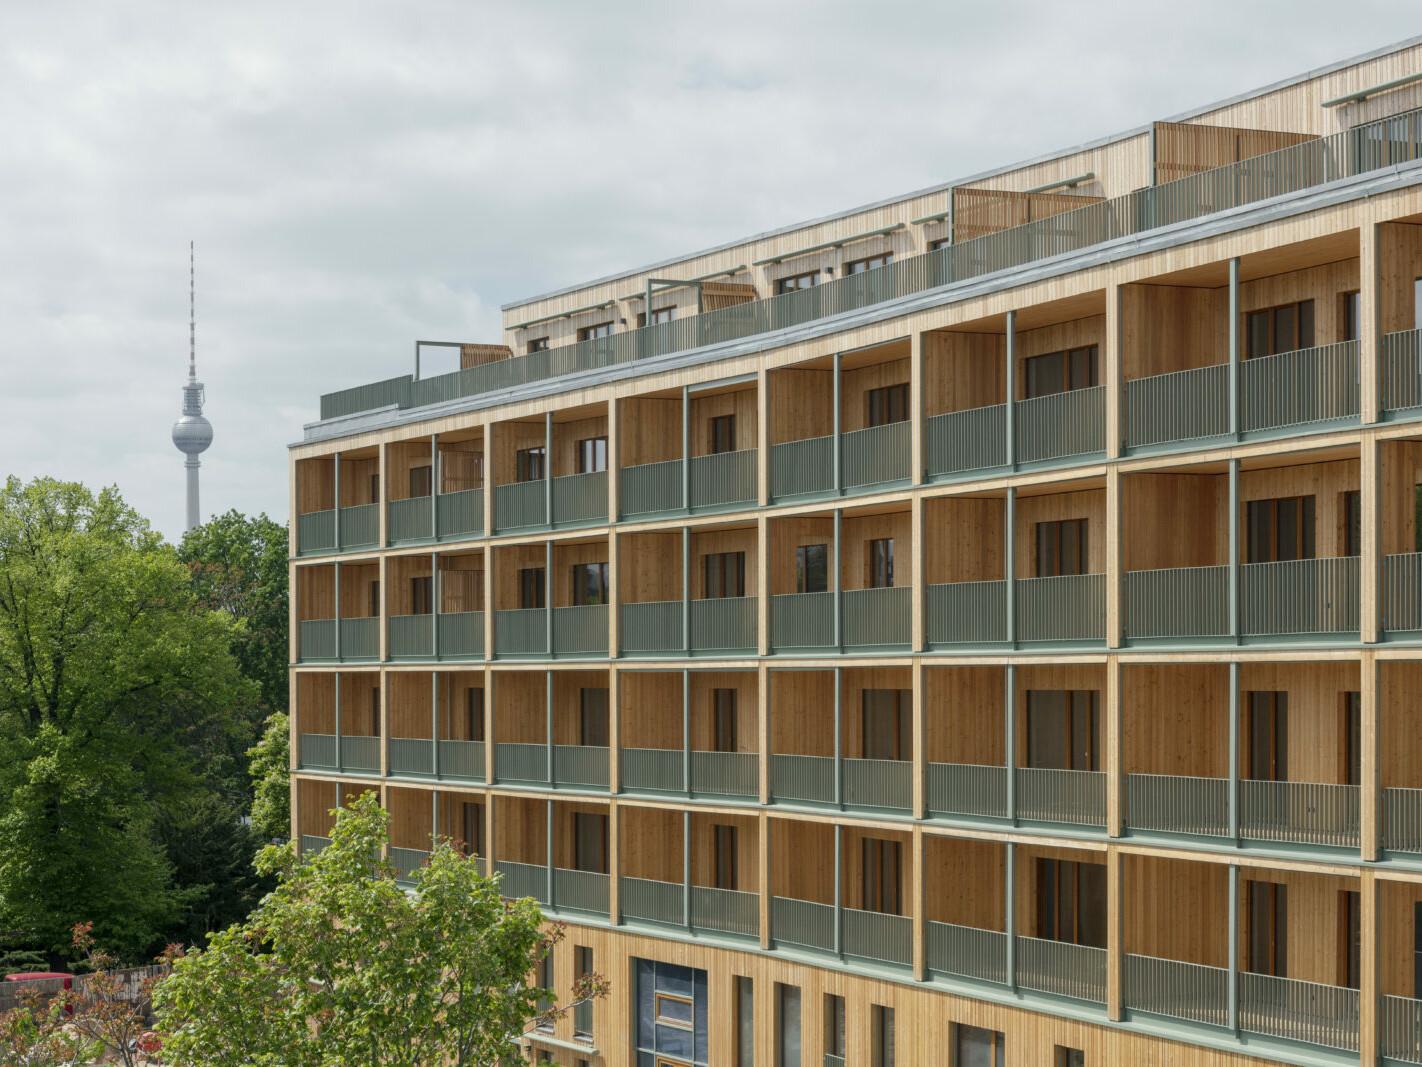 Landsberger Allee _Berlin_Holzbau-Wohnhaus_brandschutz-plus-eberl-pacan-brandschutzplaner_Perspektive Garten_Jan Bitter